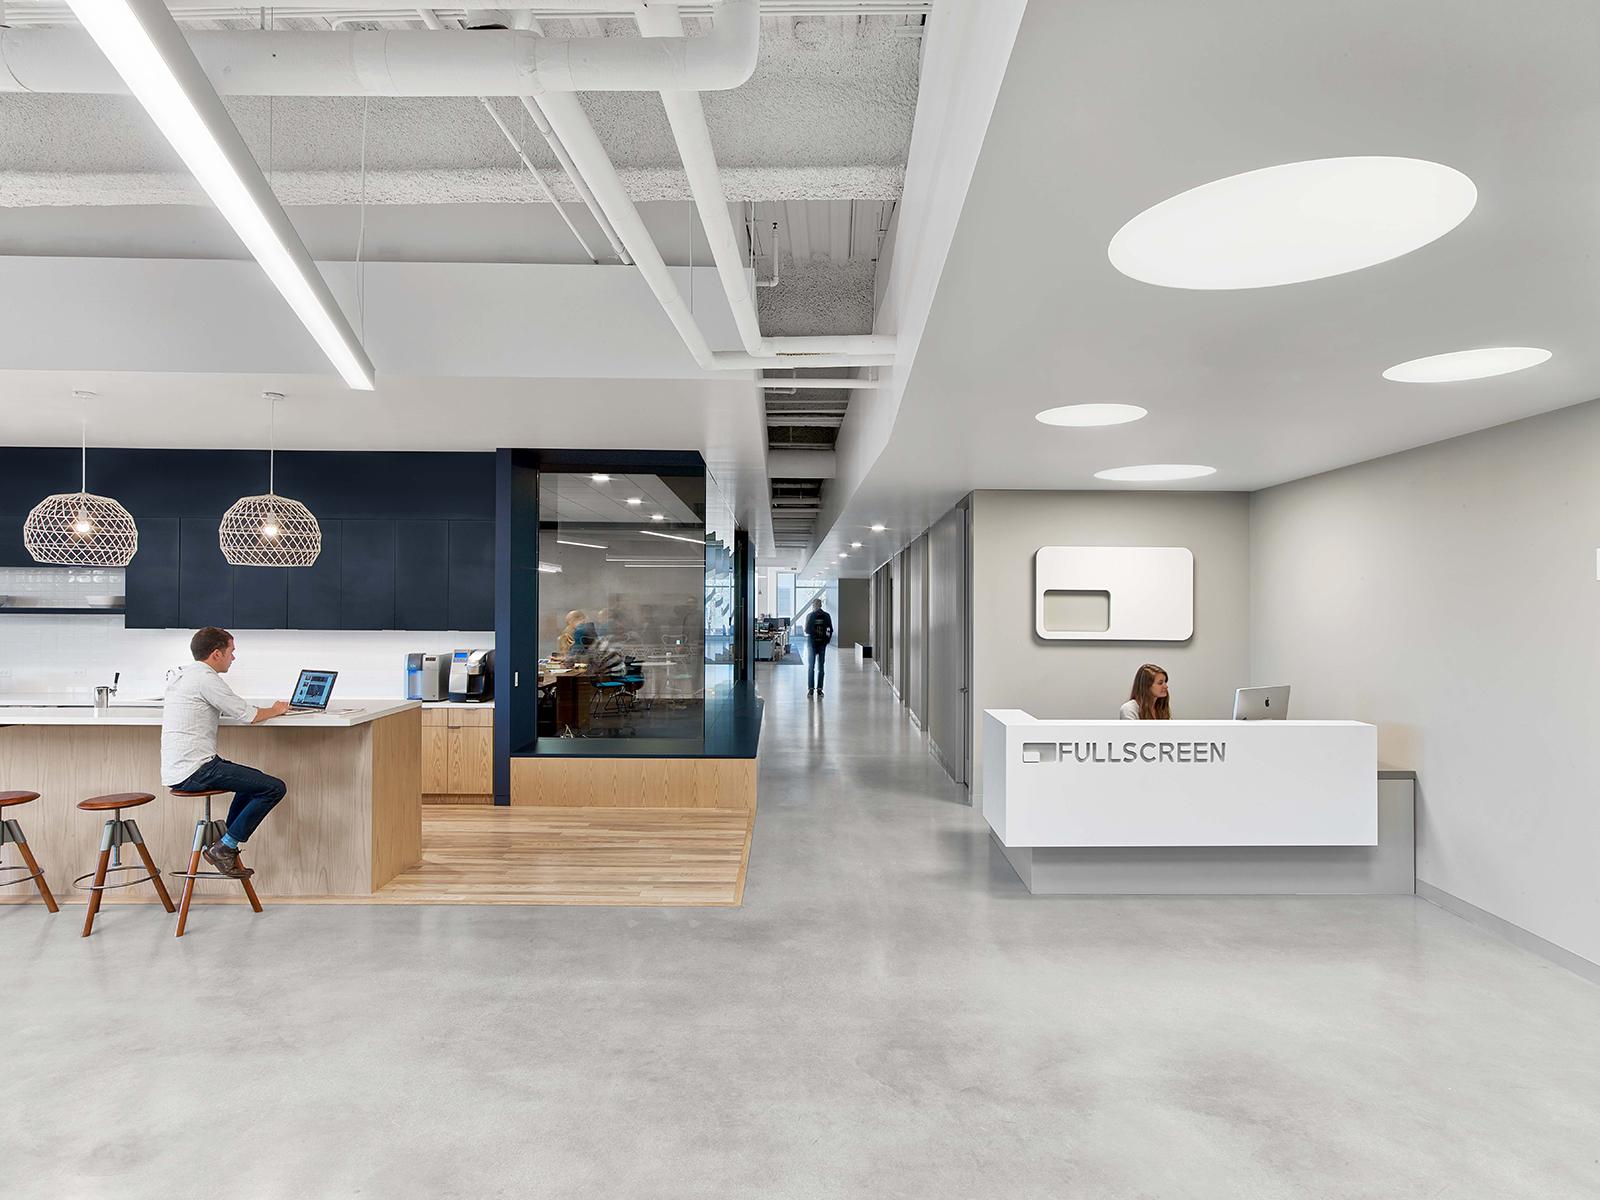 fullscreen-los-angeles-office-2